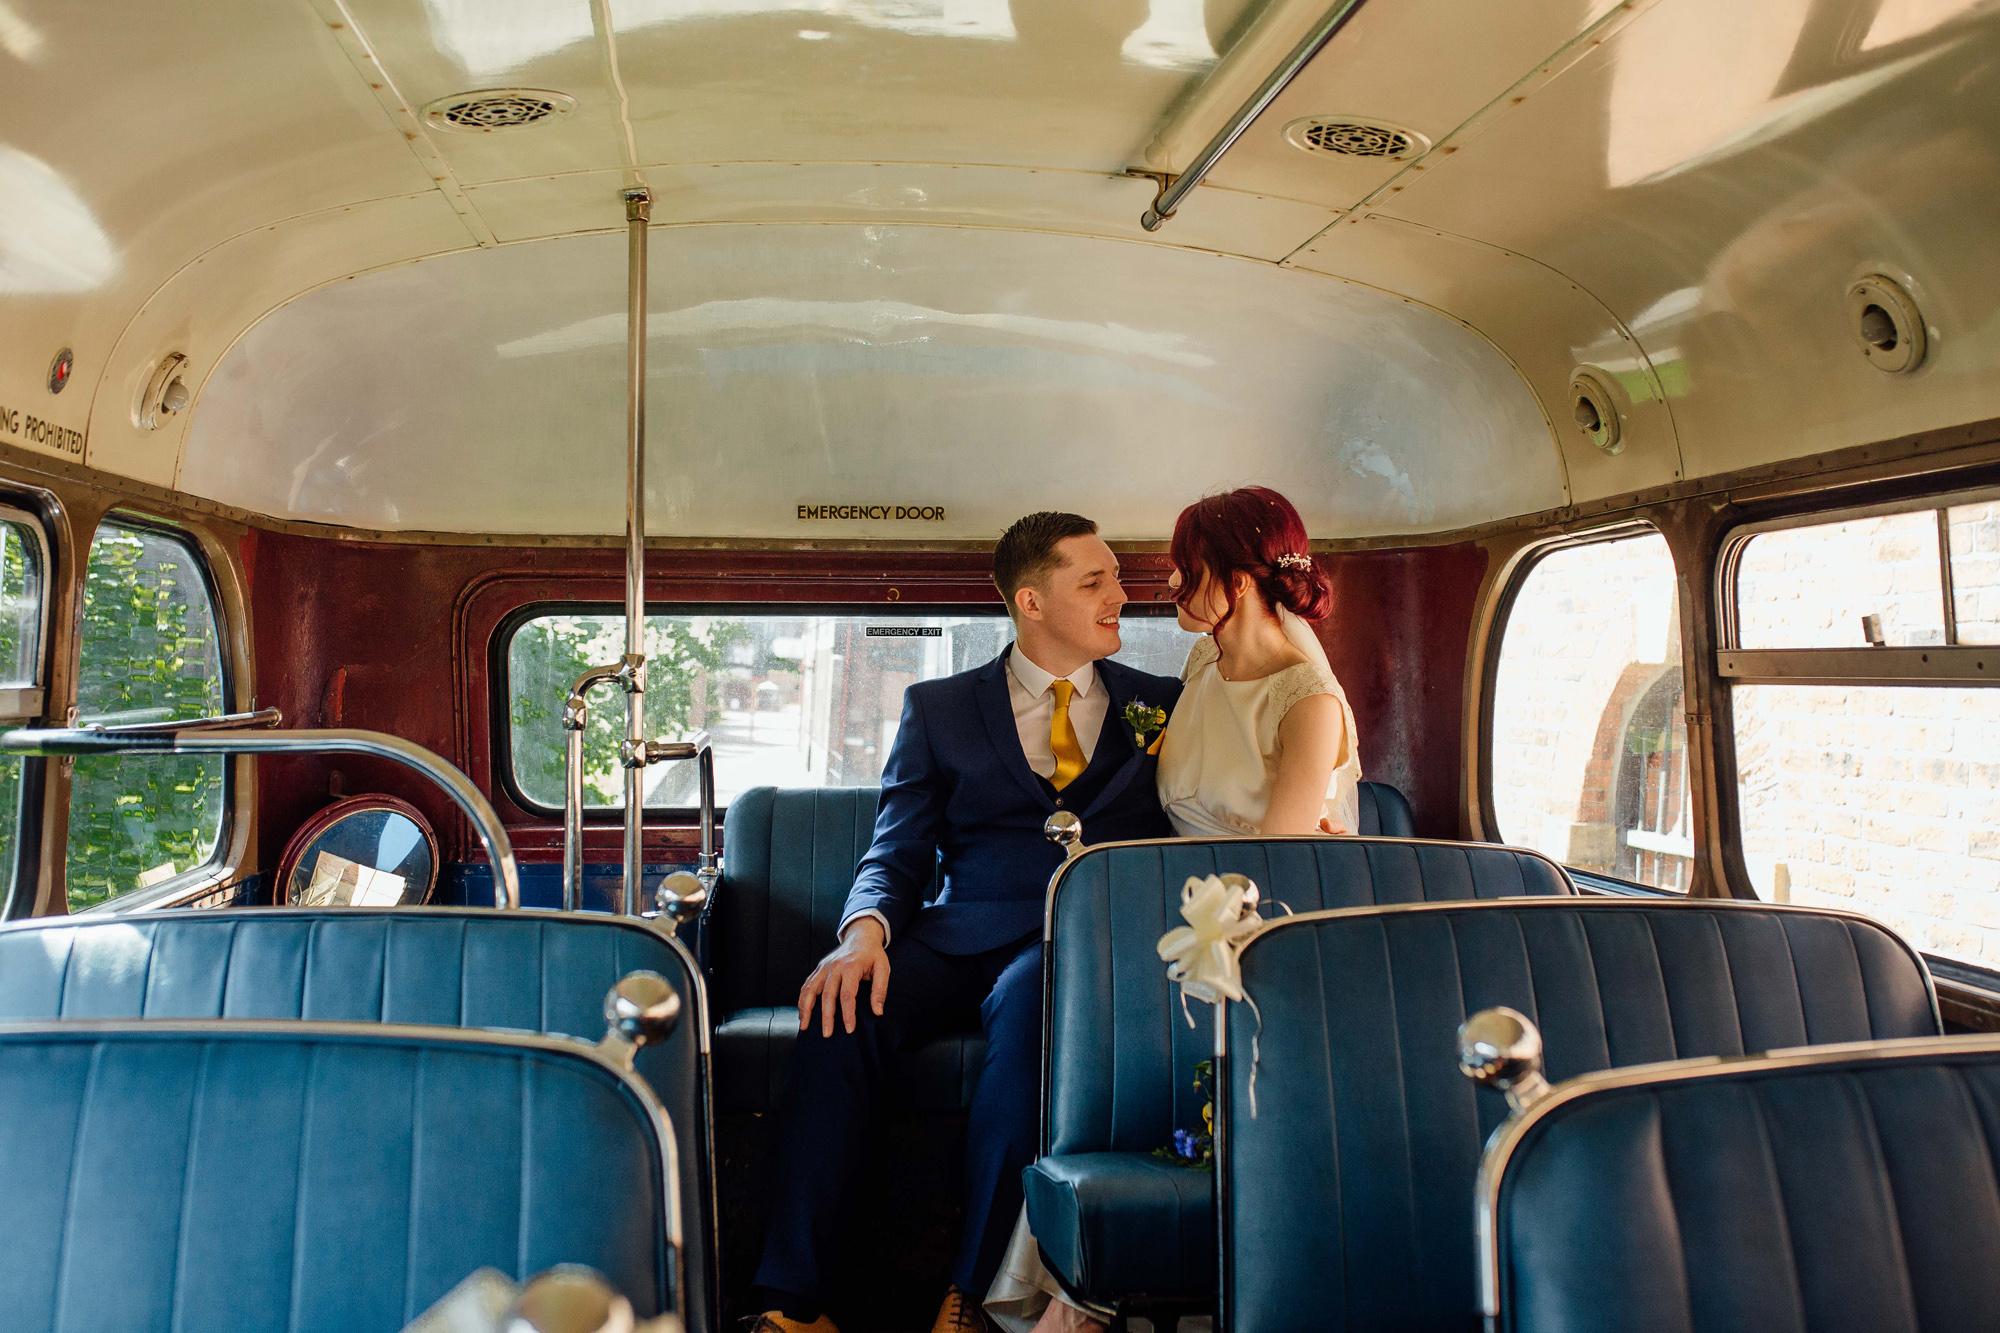 Sarah-Honeysuckle-Bias-Cut-Silk-Vintage-Inspired-Wedding-Gown-Sheffield-Wedding-Kate-Beaumont-39.jpg